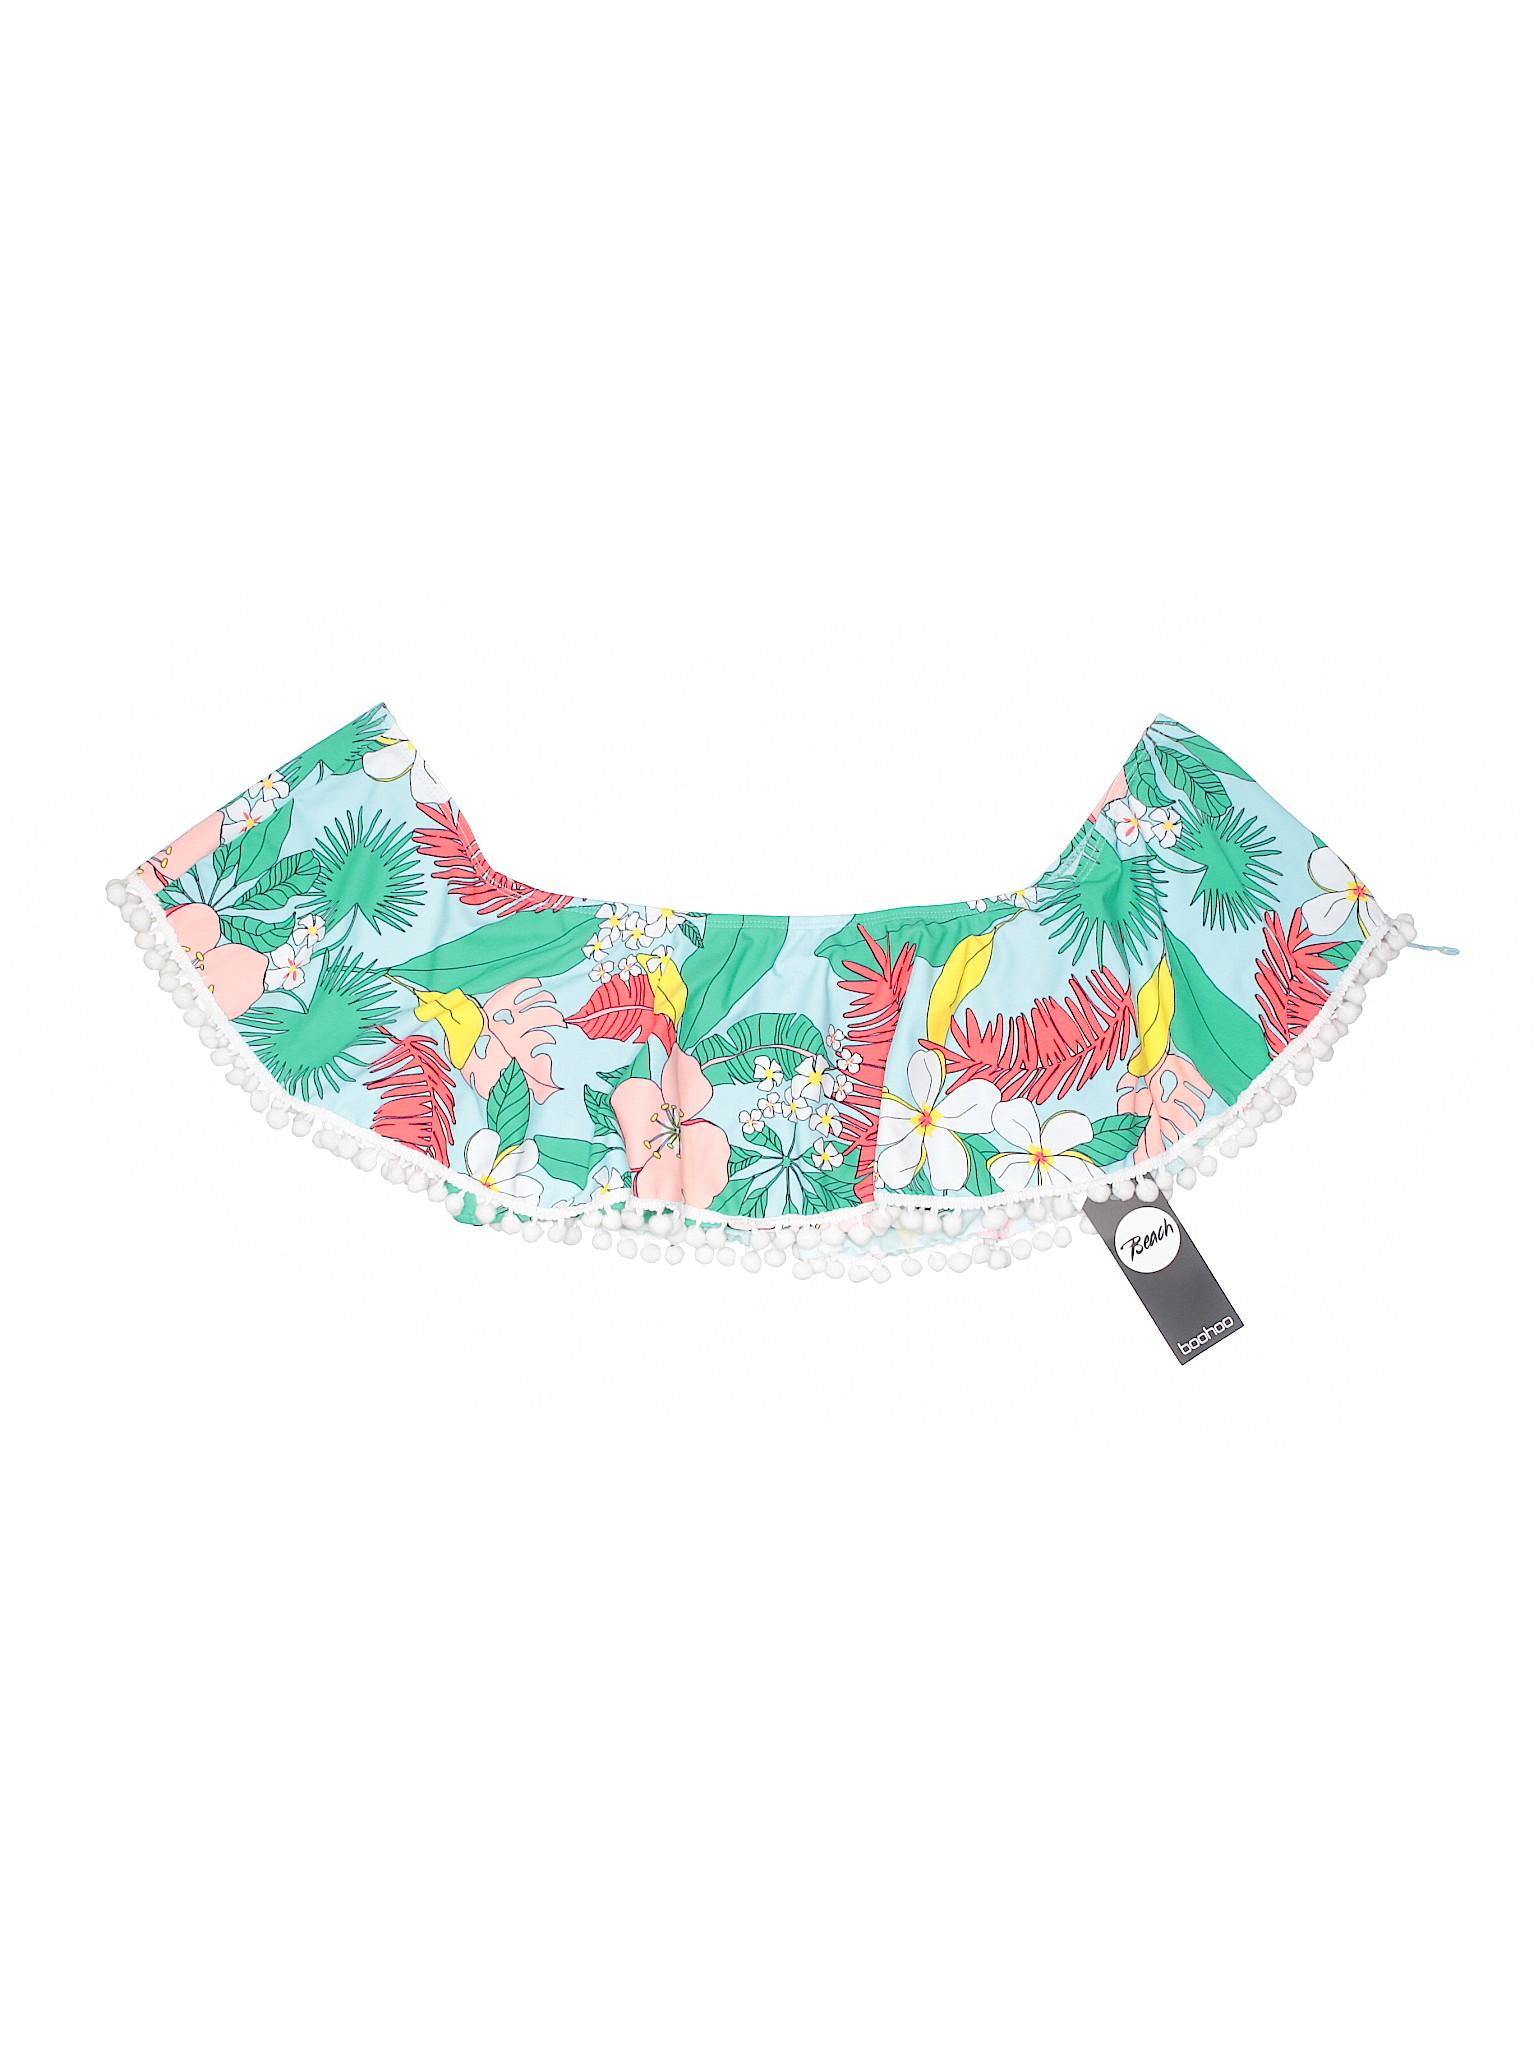 Boutique Boutique Swimsuit Boutique Boohoo Boutique Top Boohoo T6fdxqwg